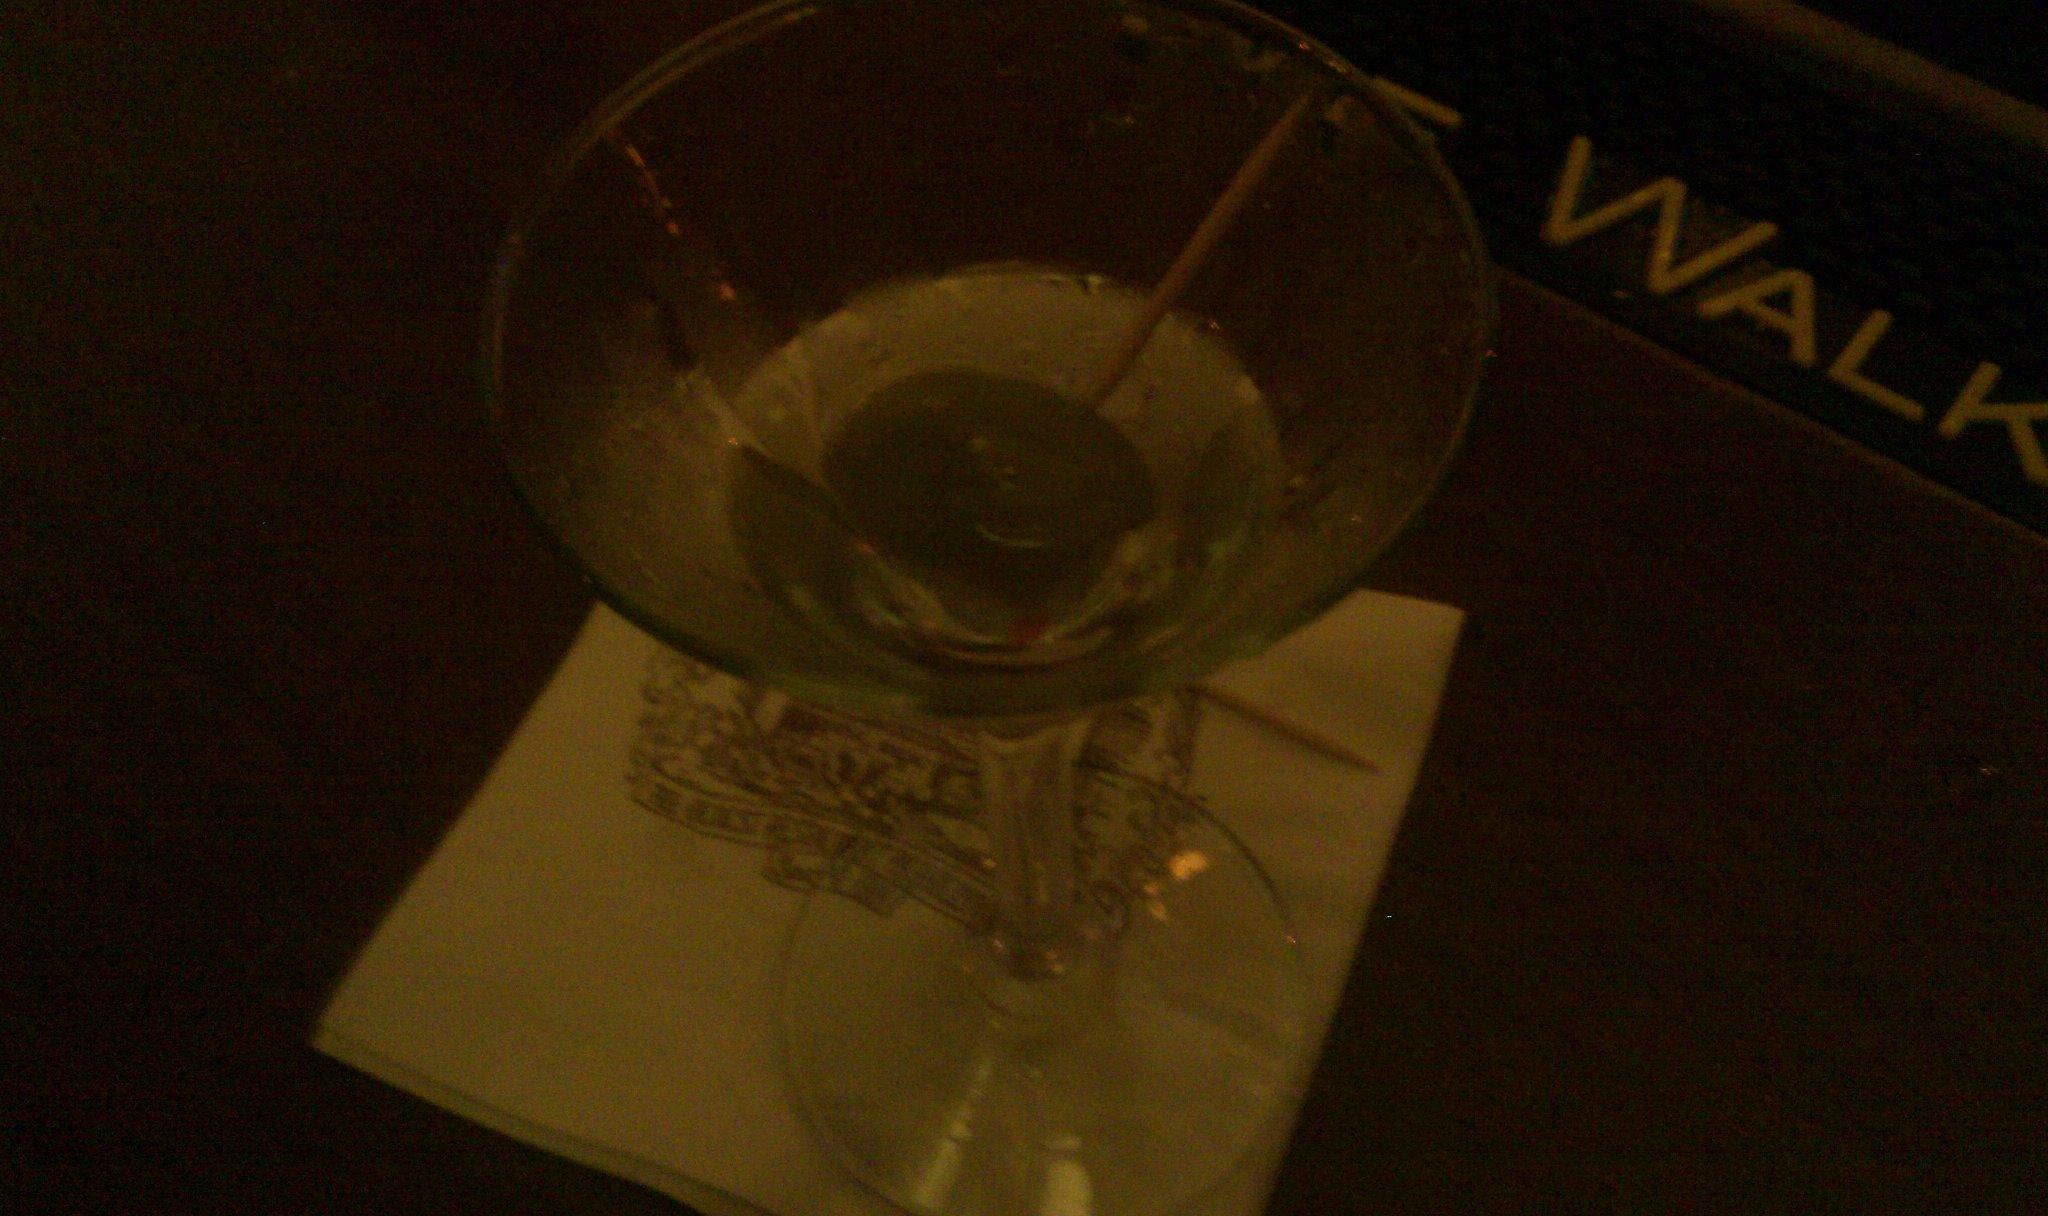 Musso & Franks martini